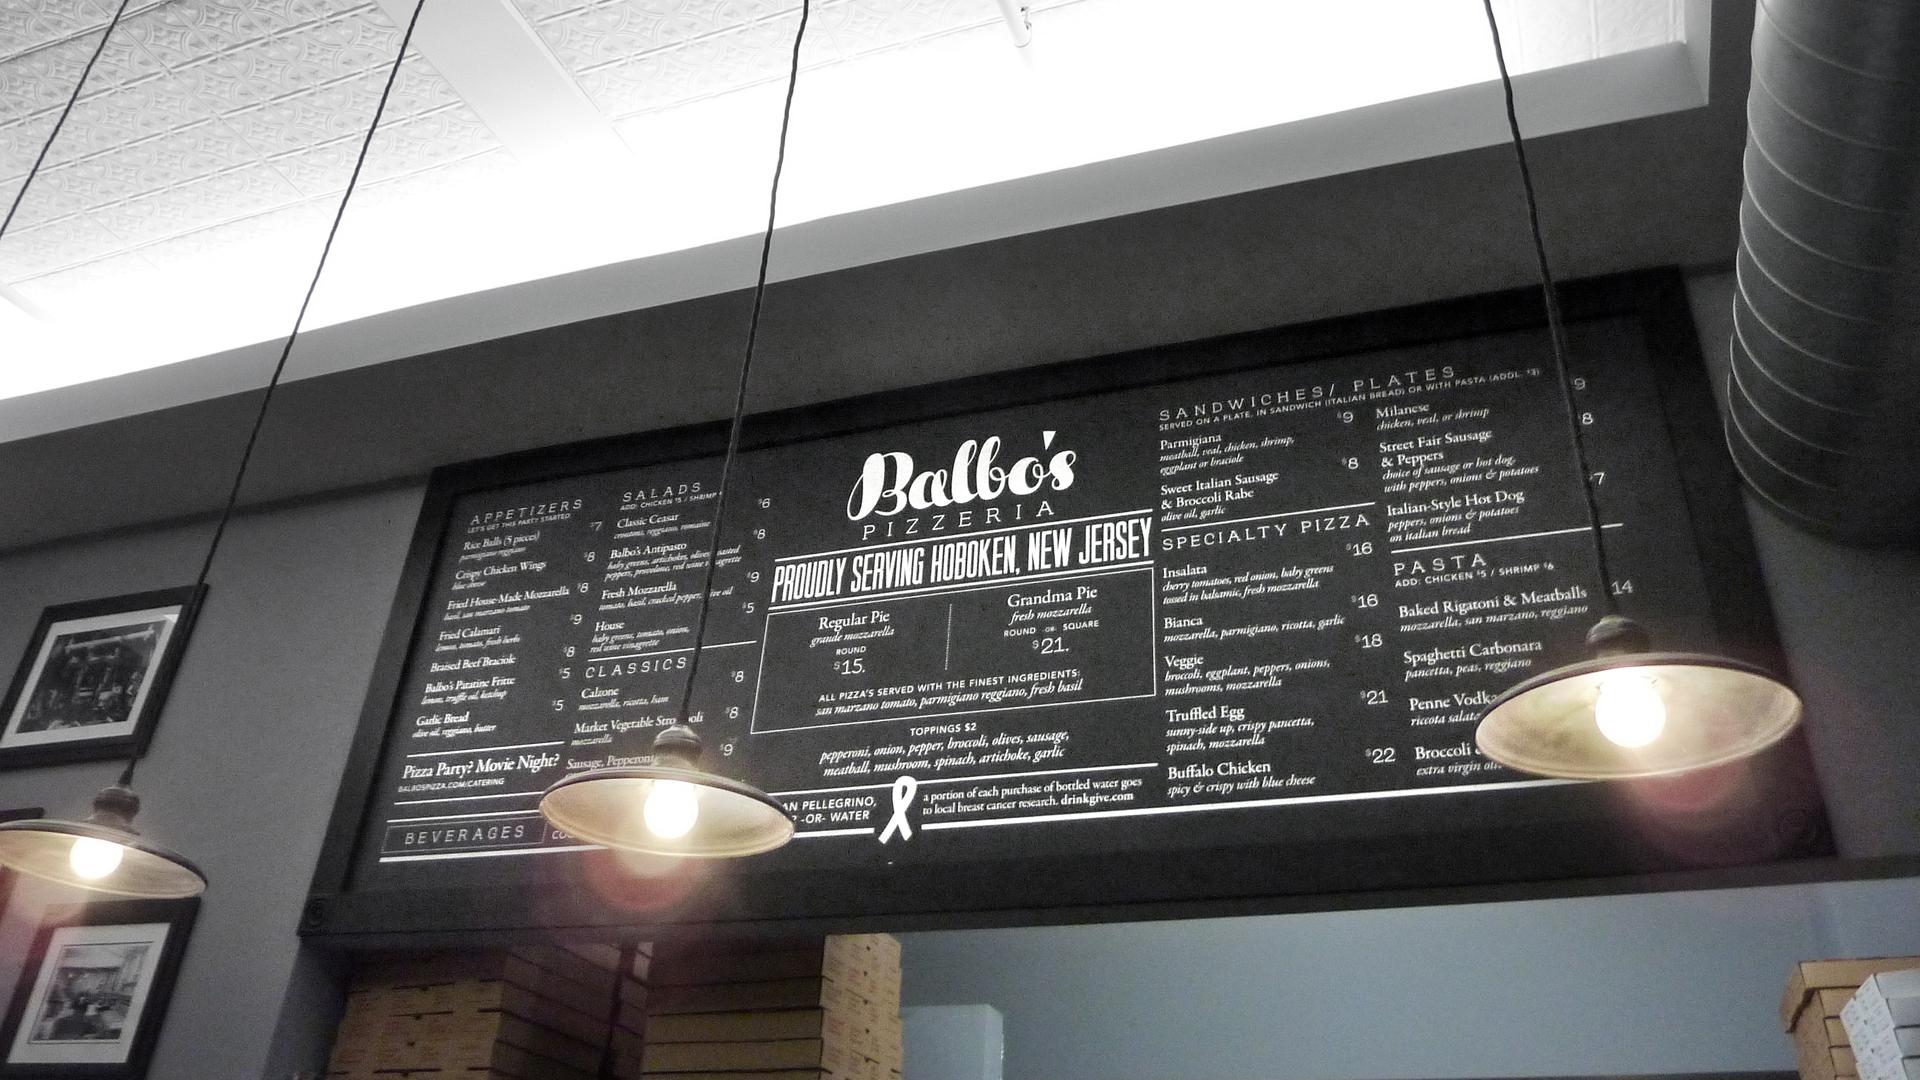 Balbos_menu_sign.jpg